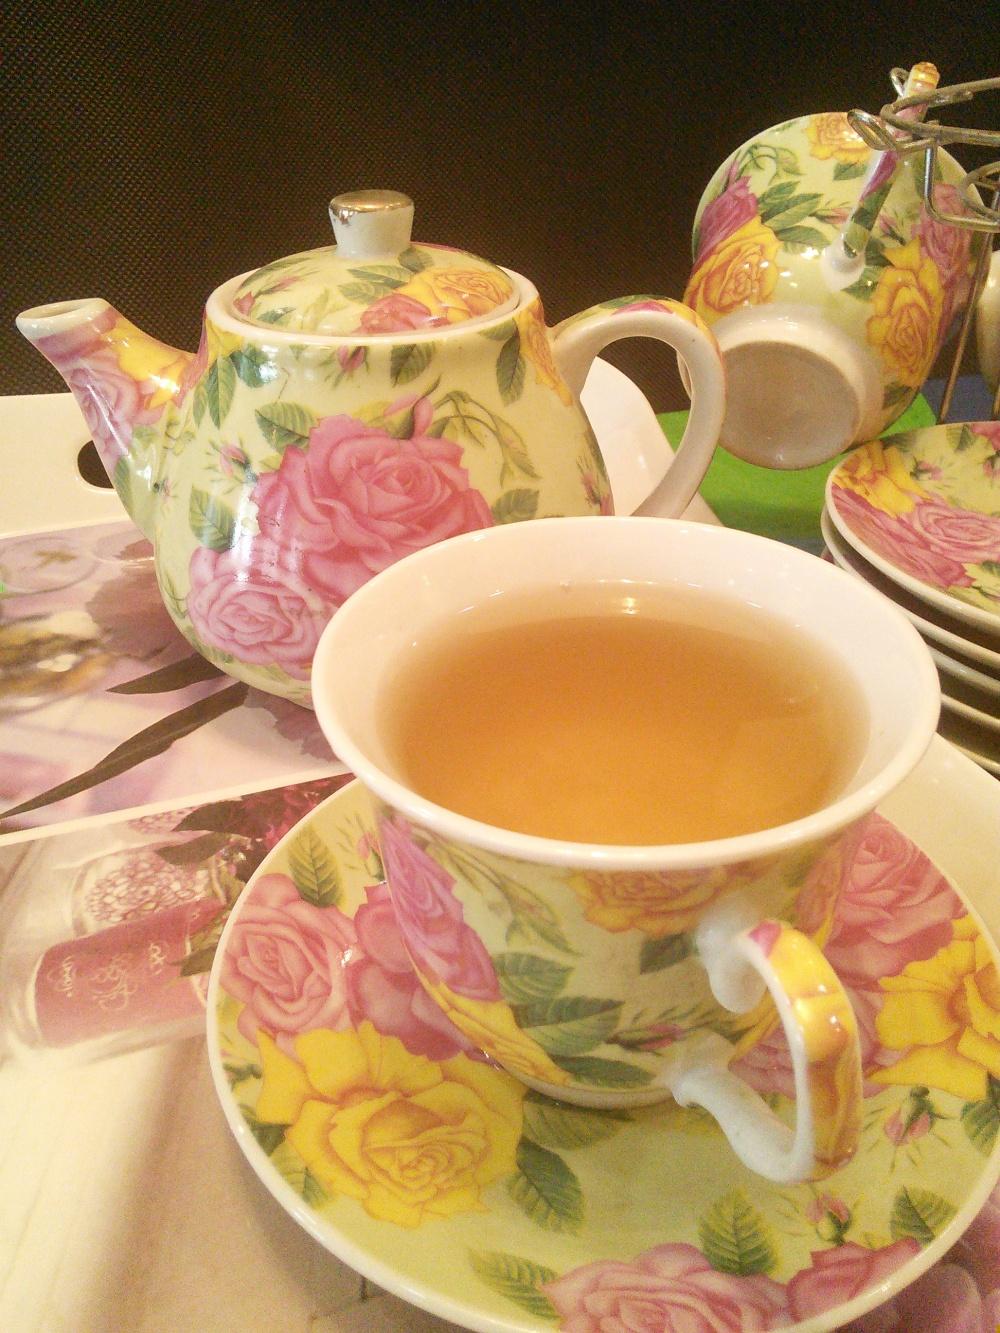 Green tea.... Tea is liquid peace, comfort, goodness and joy.